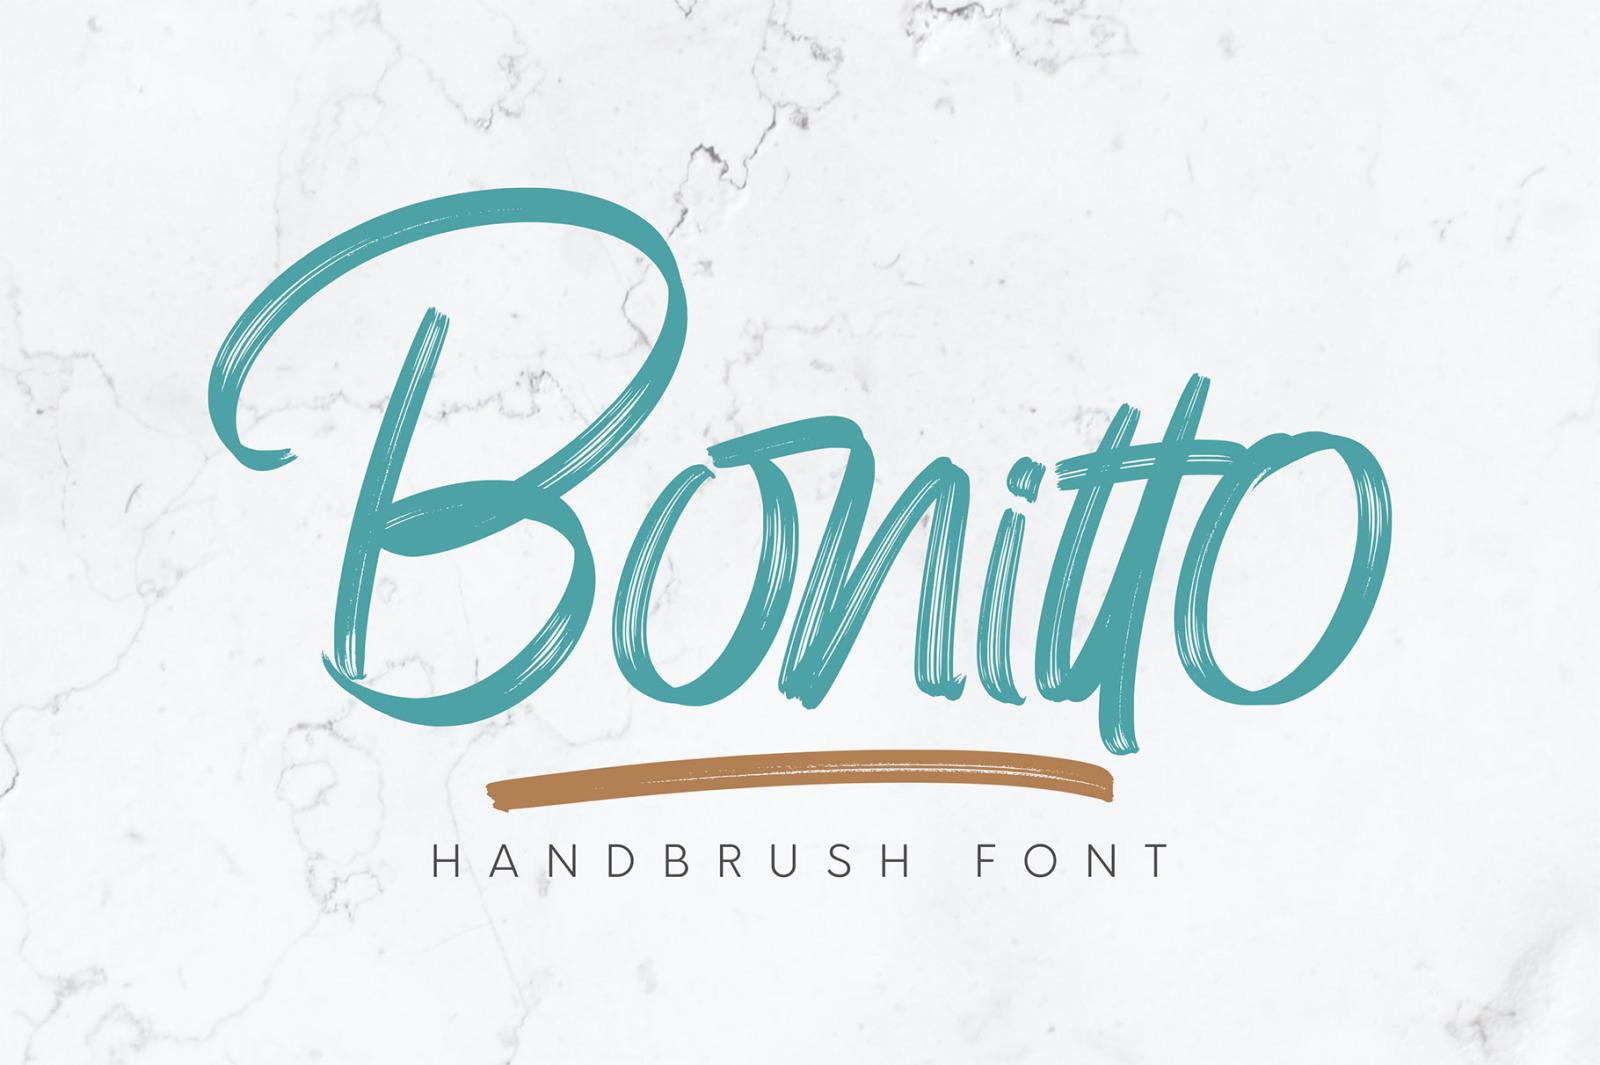 Bonitto